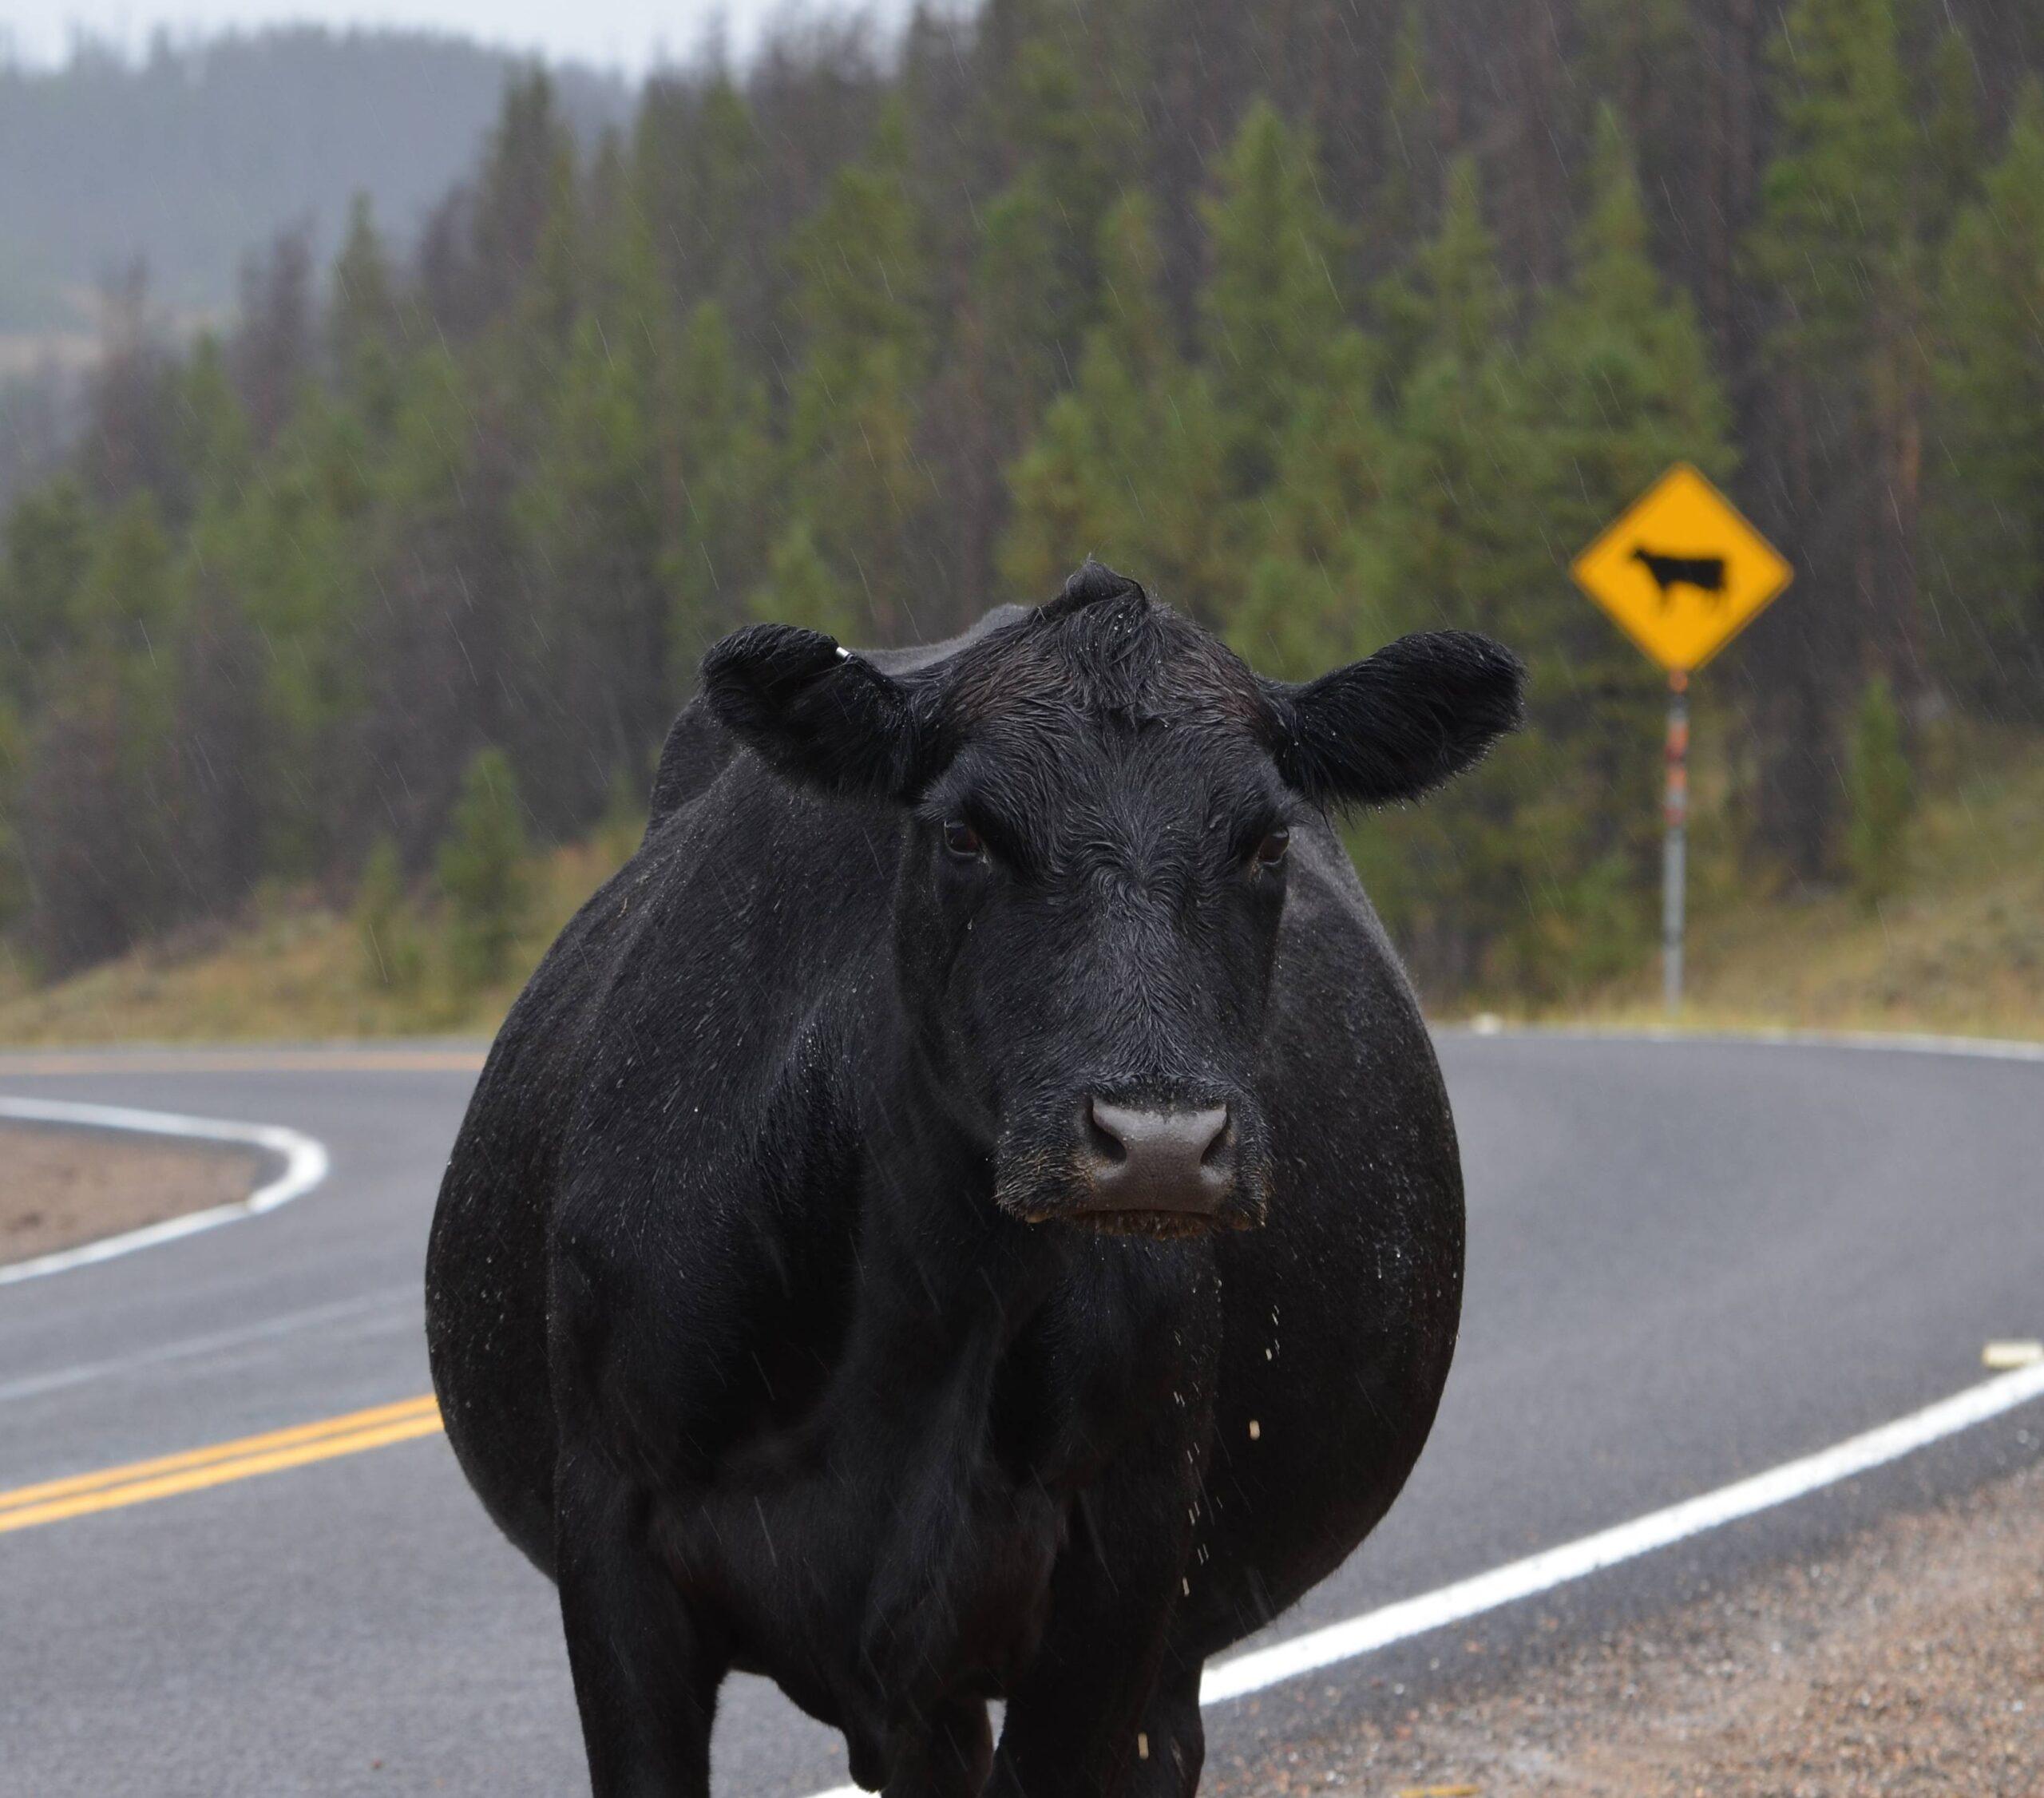 Free range steer stands along Colorado roadway.